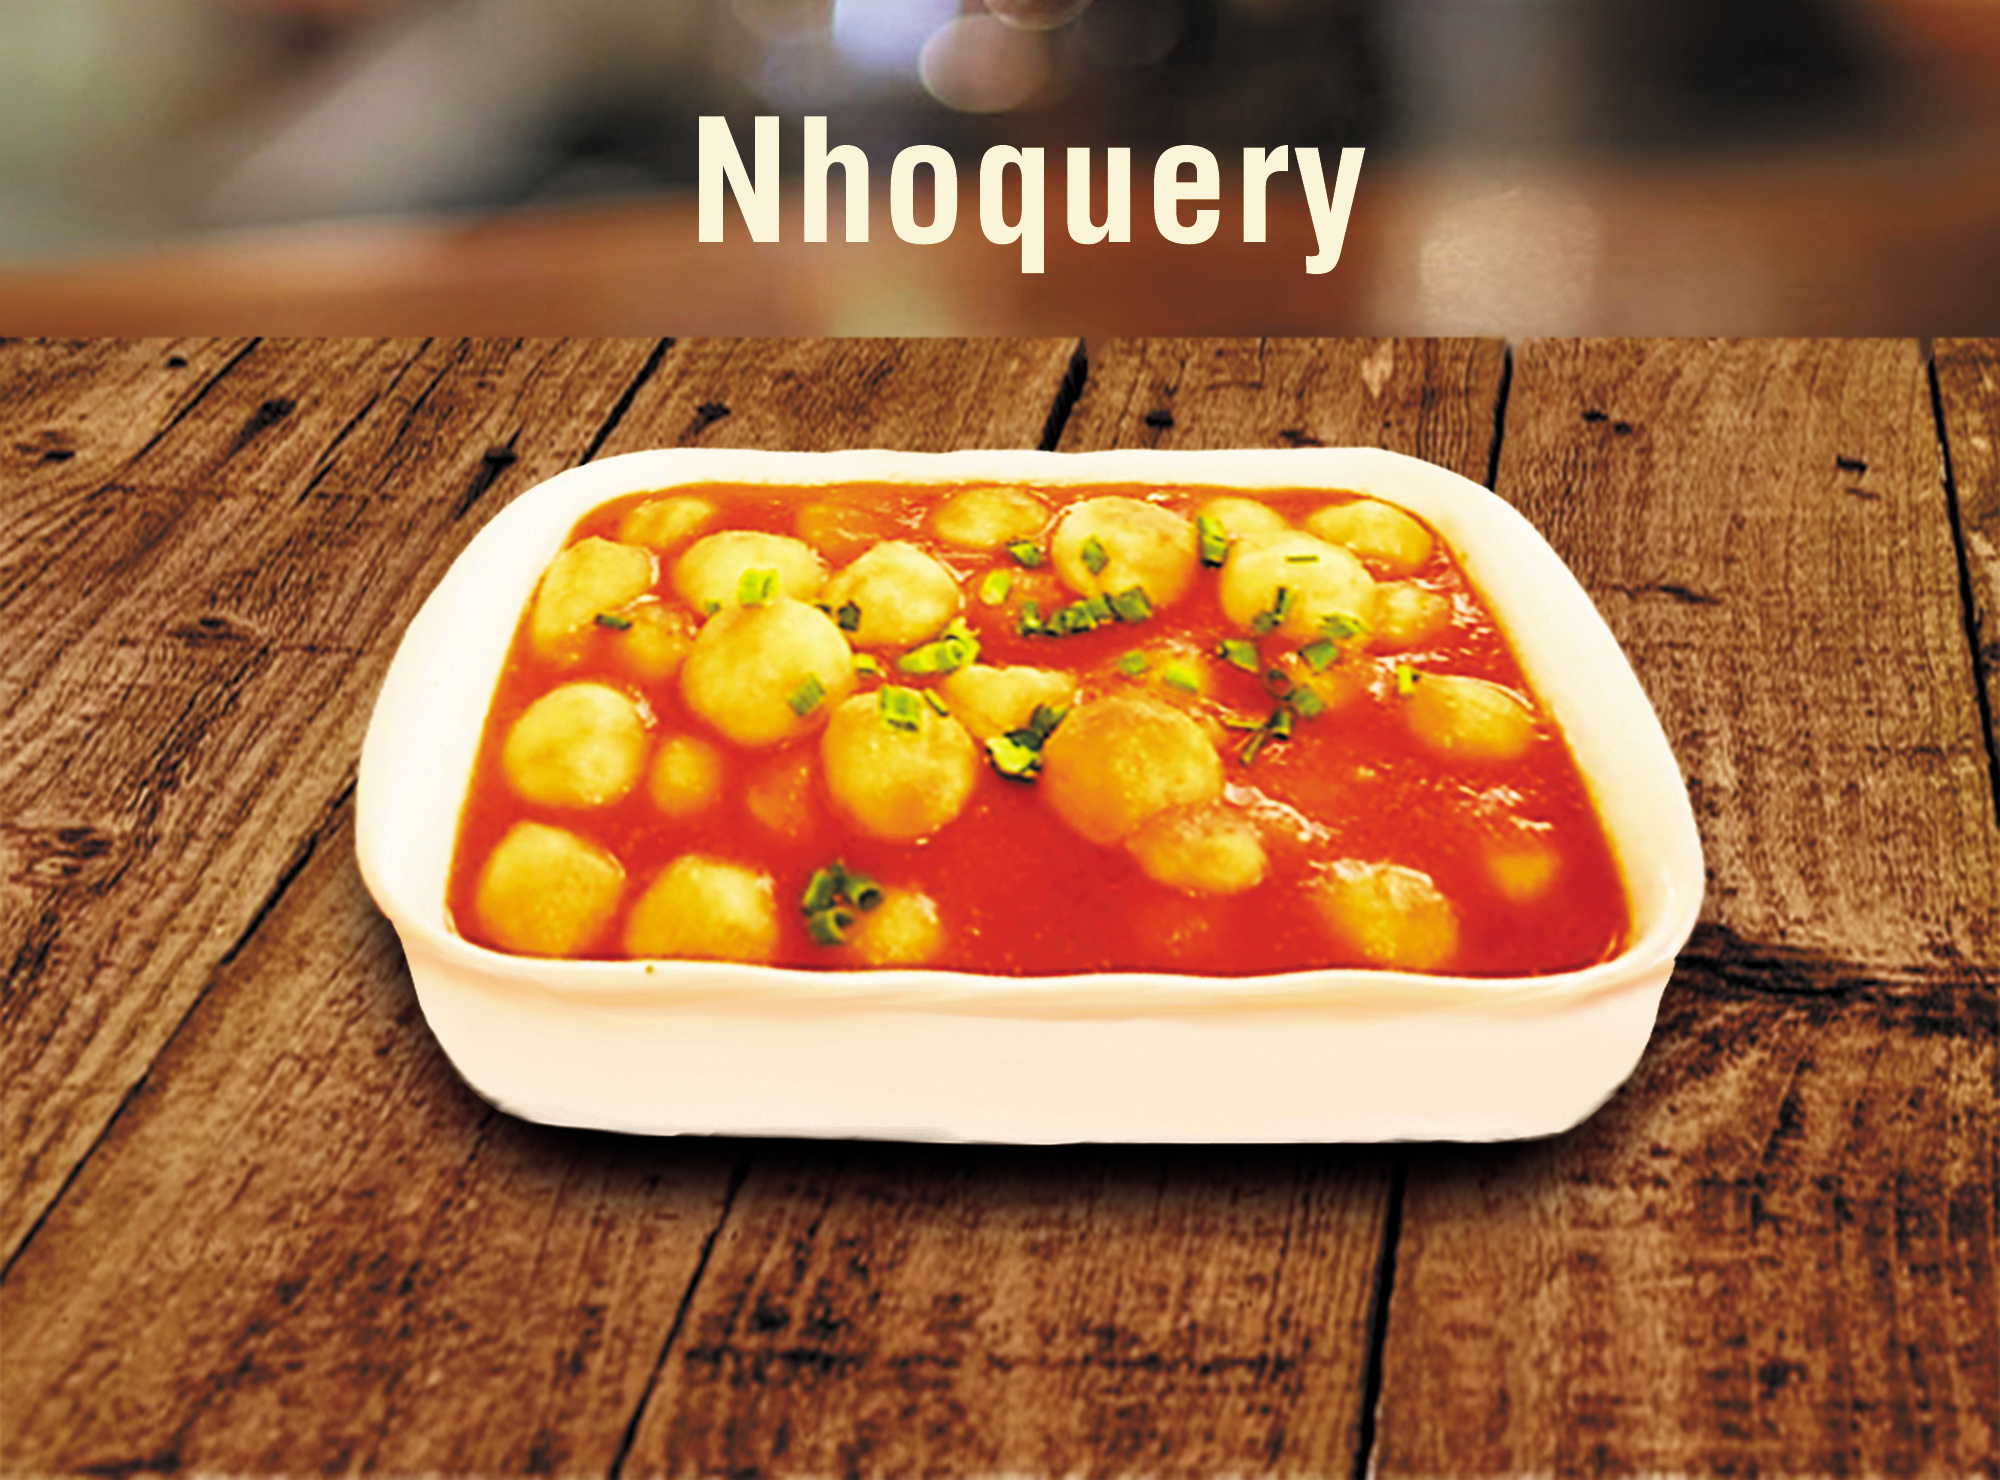 nhoquery